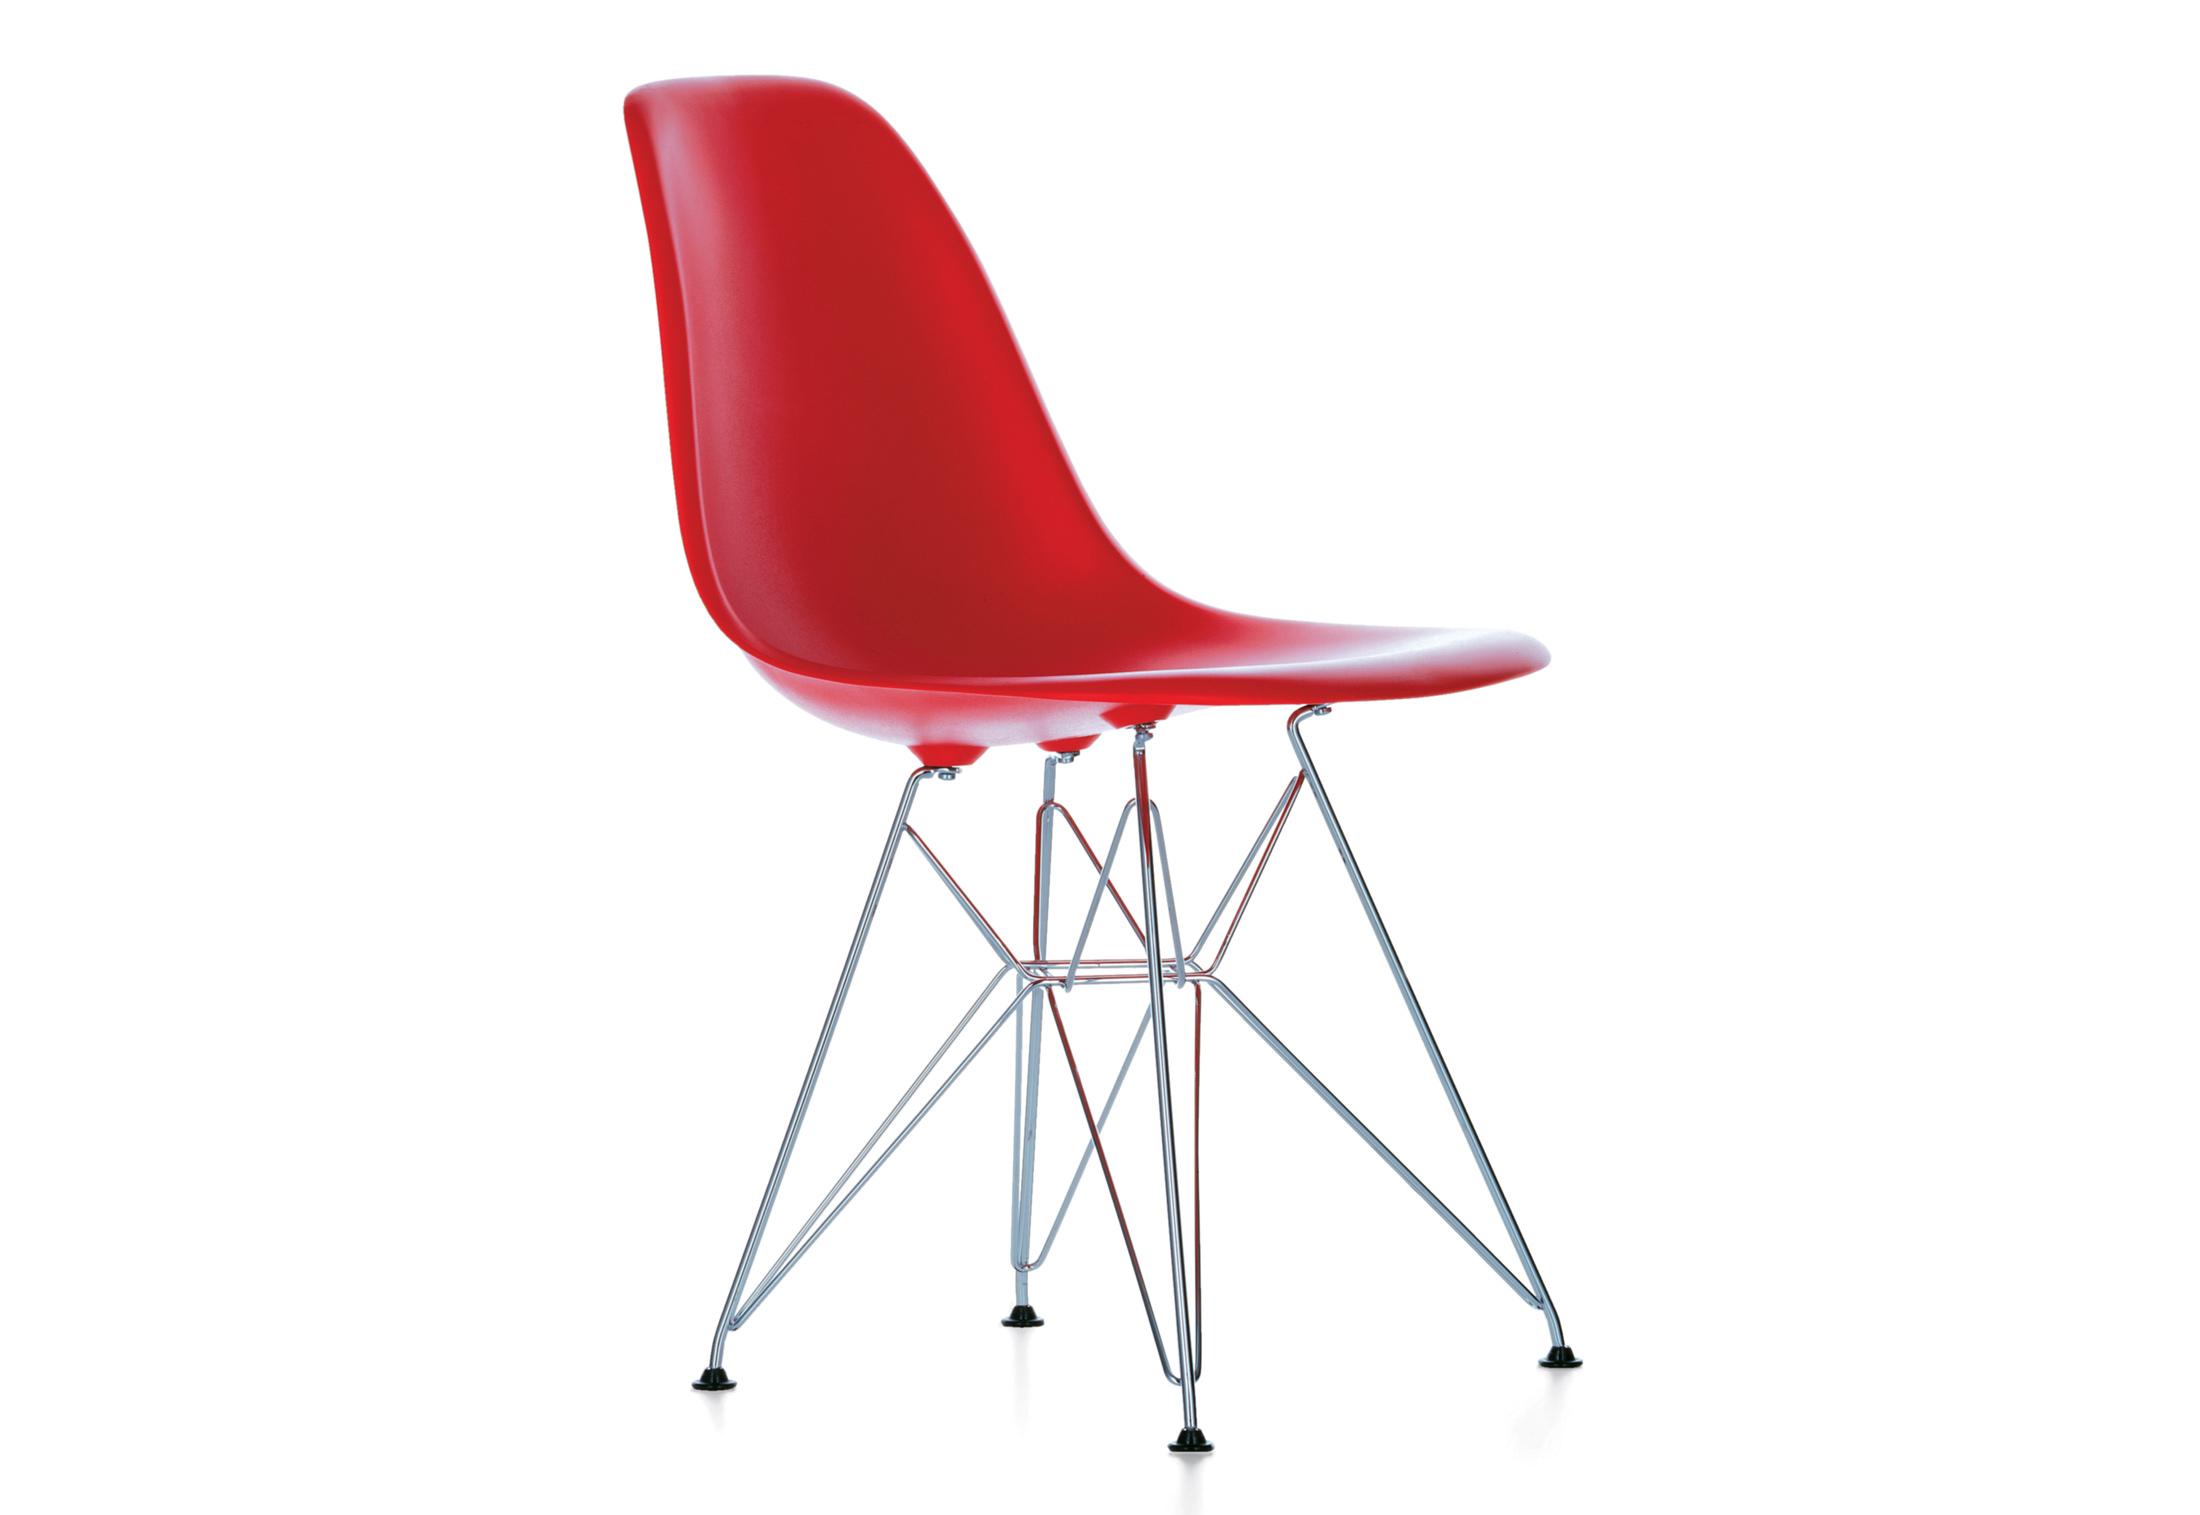 Eames Plastic Side Chair Dsr Von Vitra Stylepark